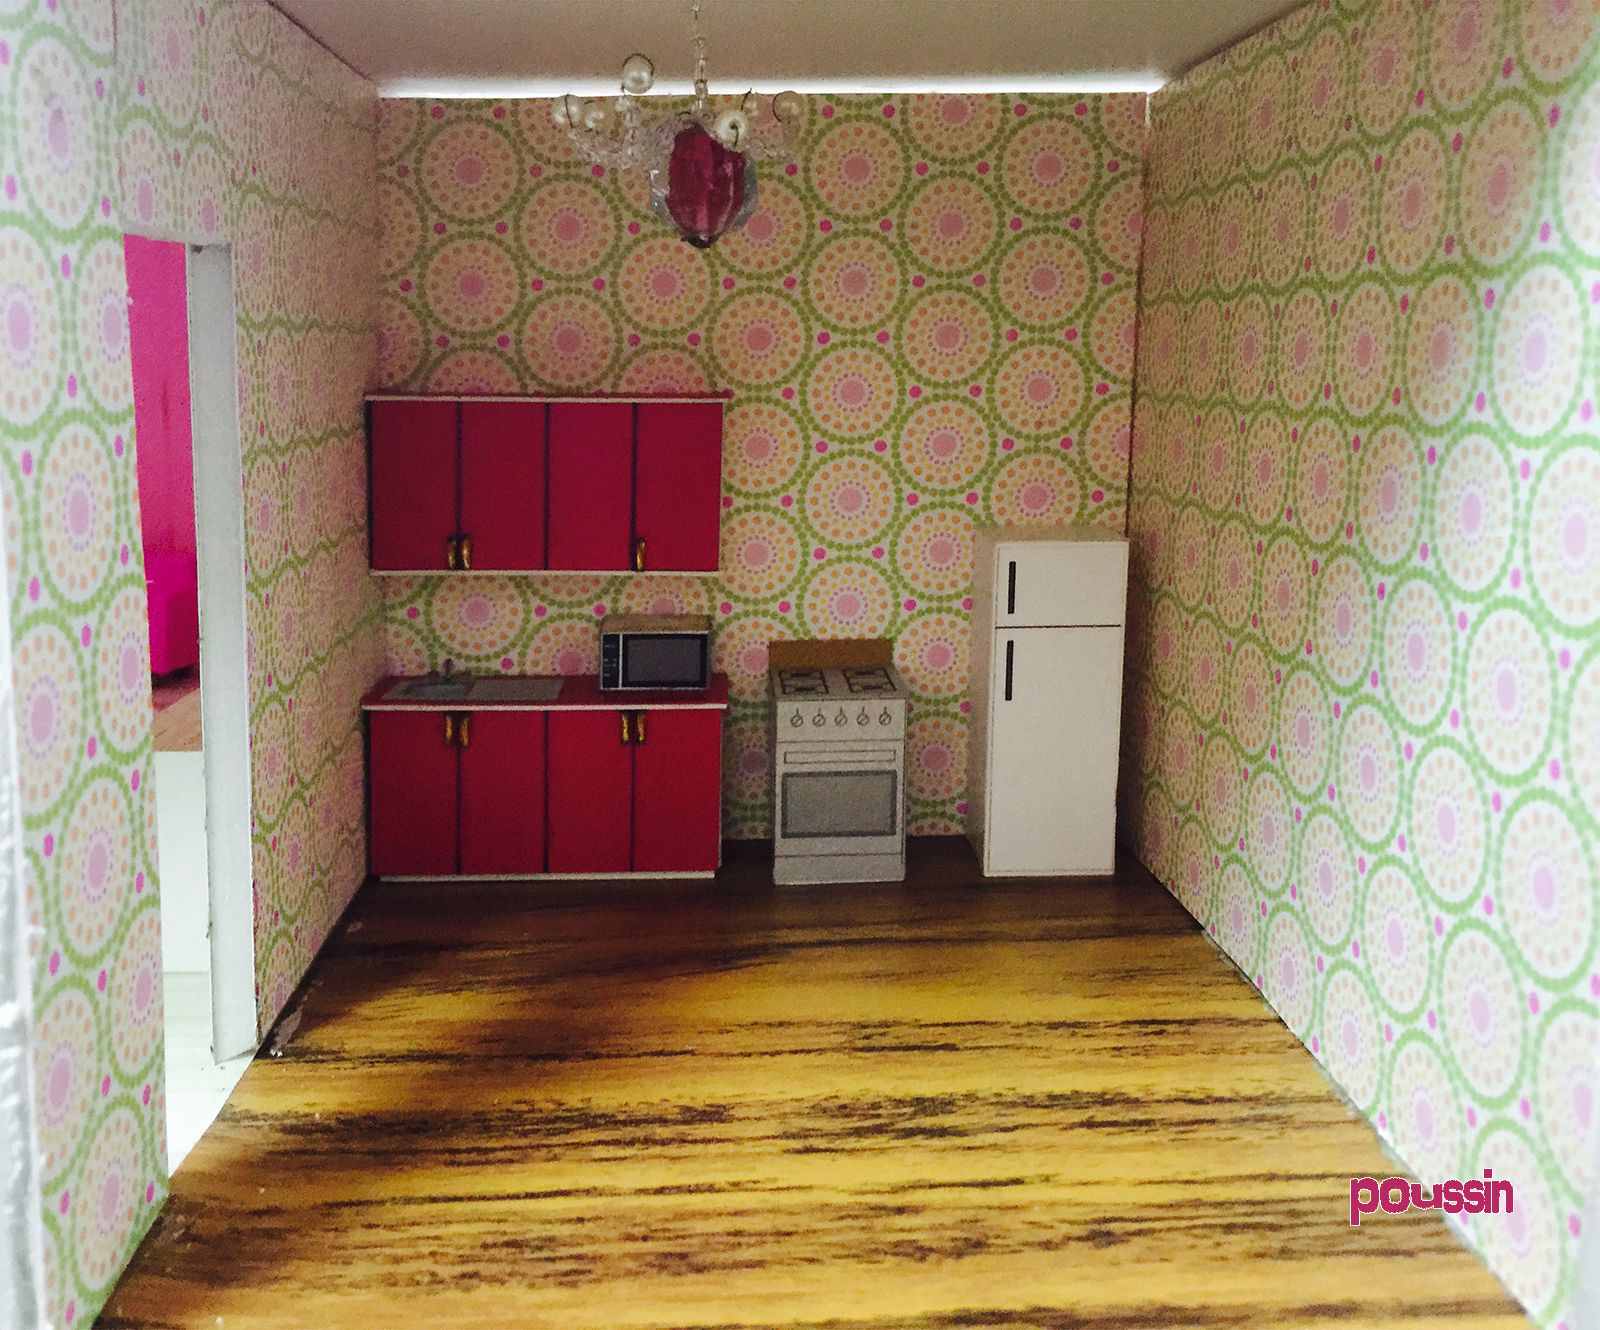 Estancia cocina maquetas dise o de interiores Quiero estudiar diseno de interiores